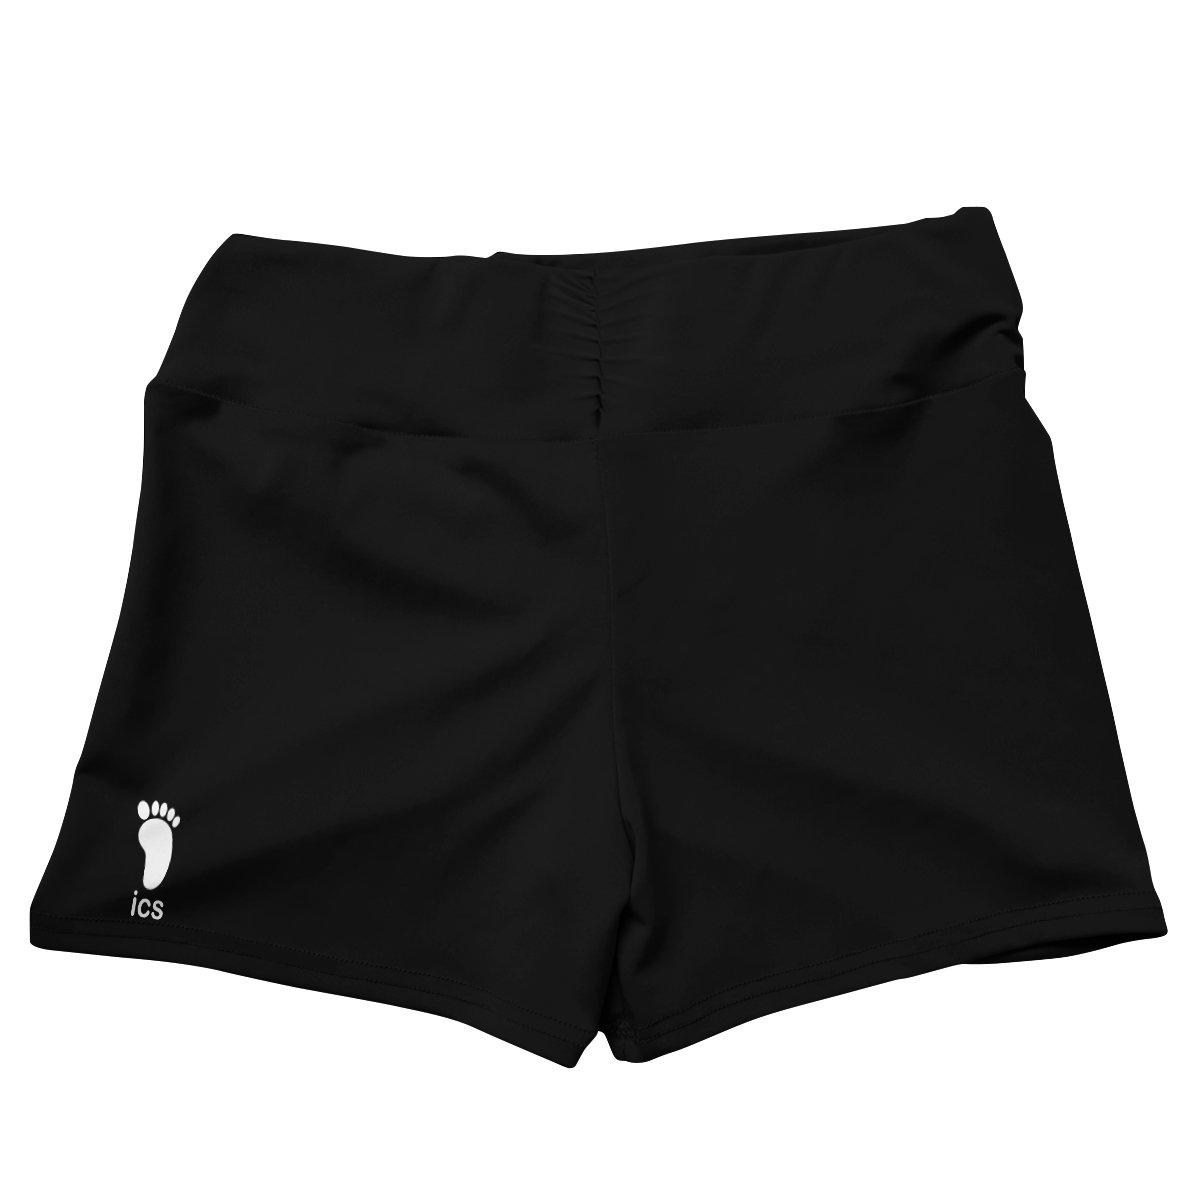 team inarizaki active wear set 346460 - Anime Swimsuits